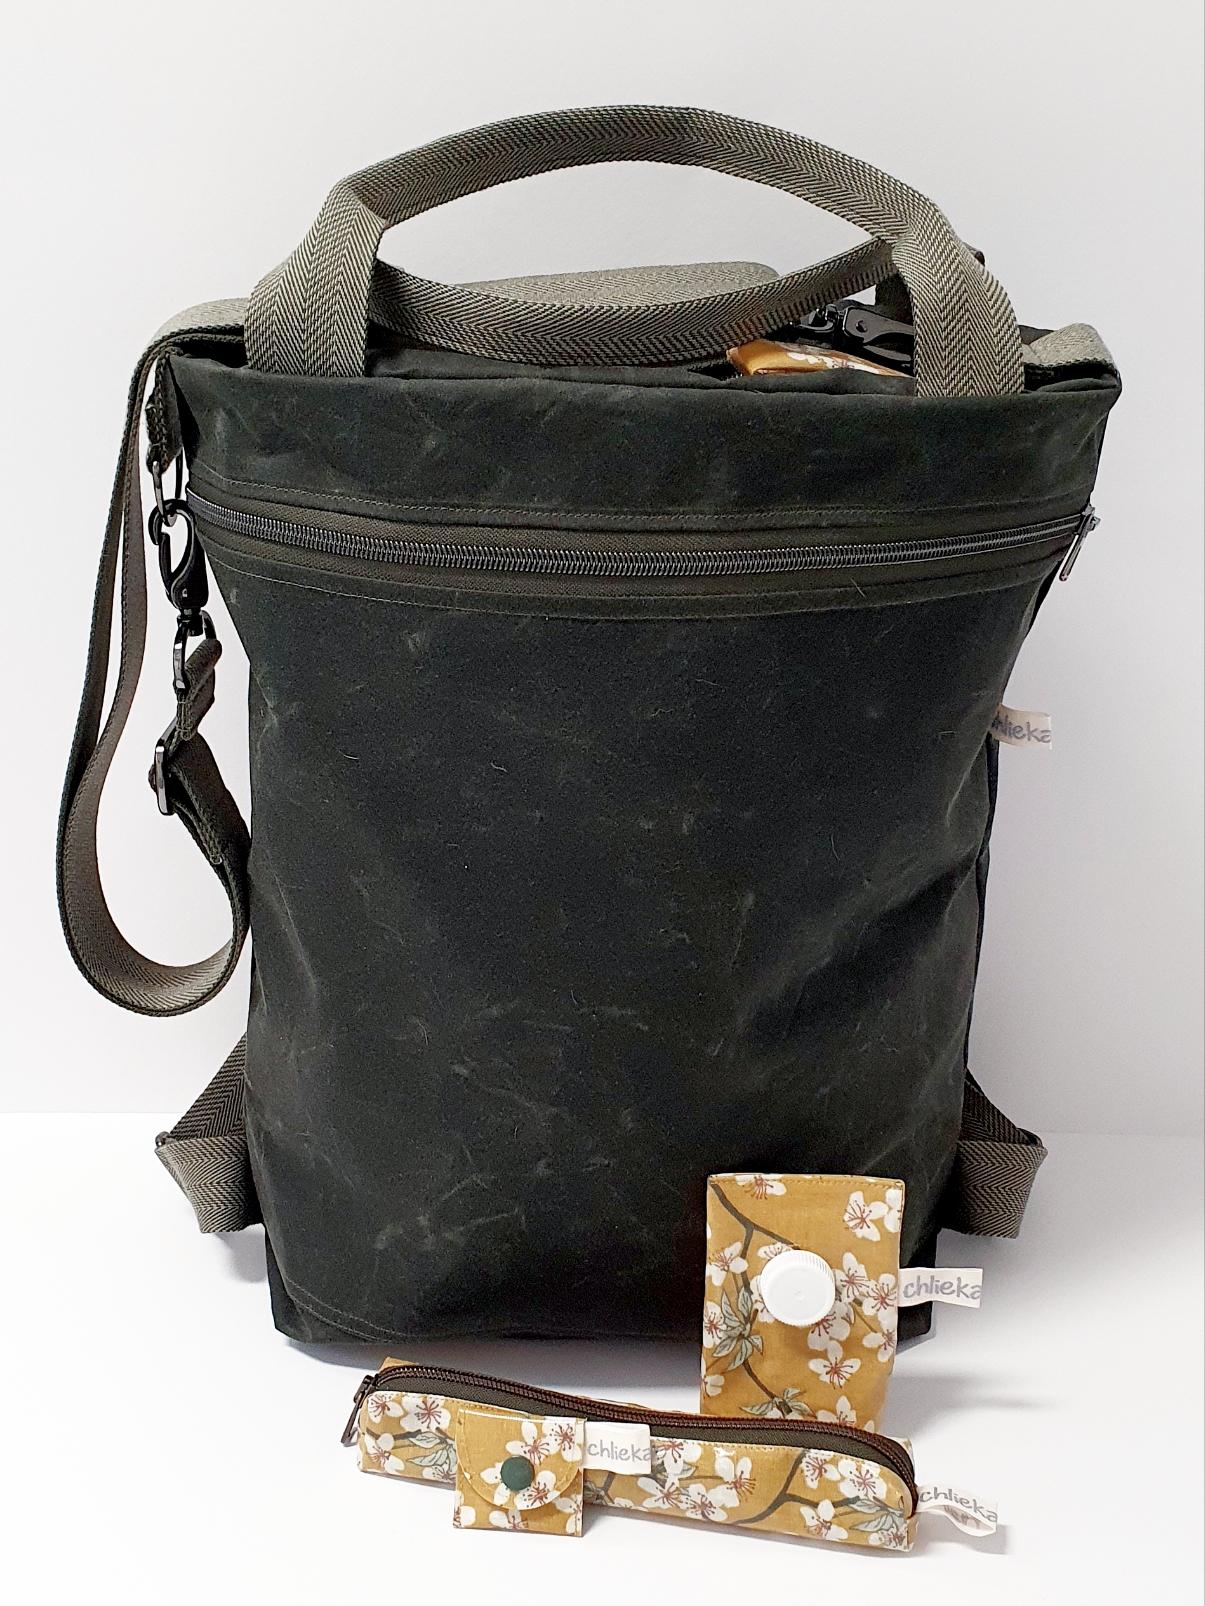 3in1 Bag Oilskin khaki, Kaugummietui,